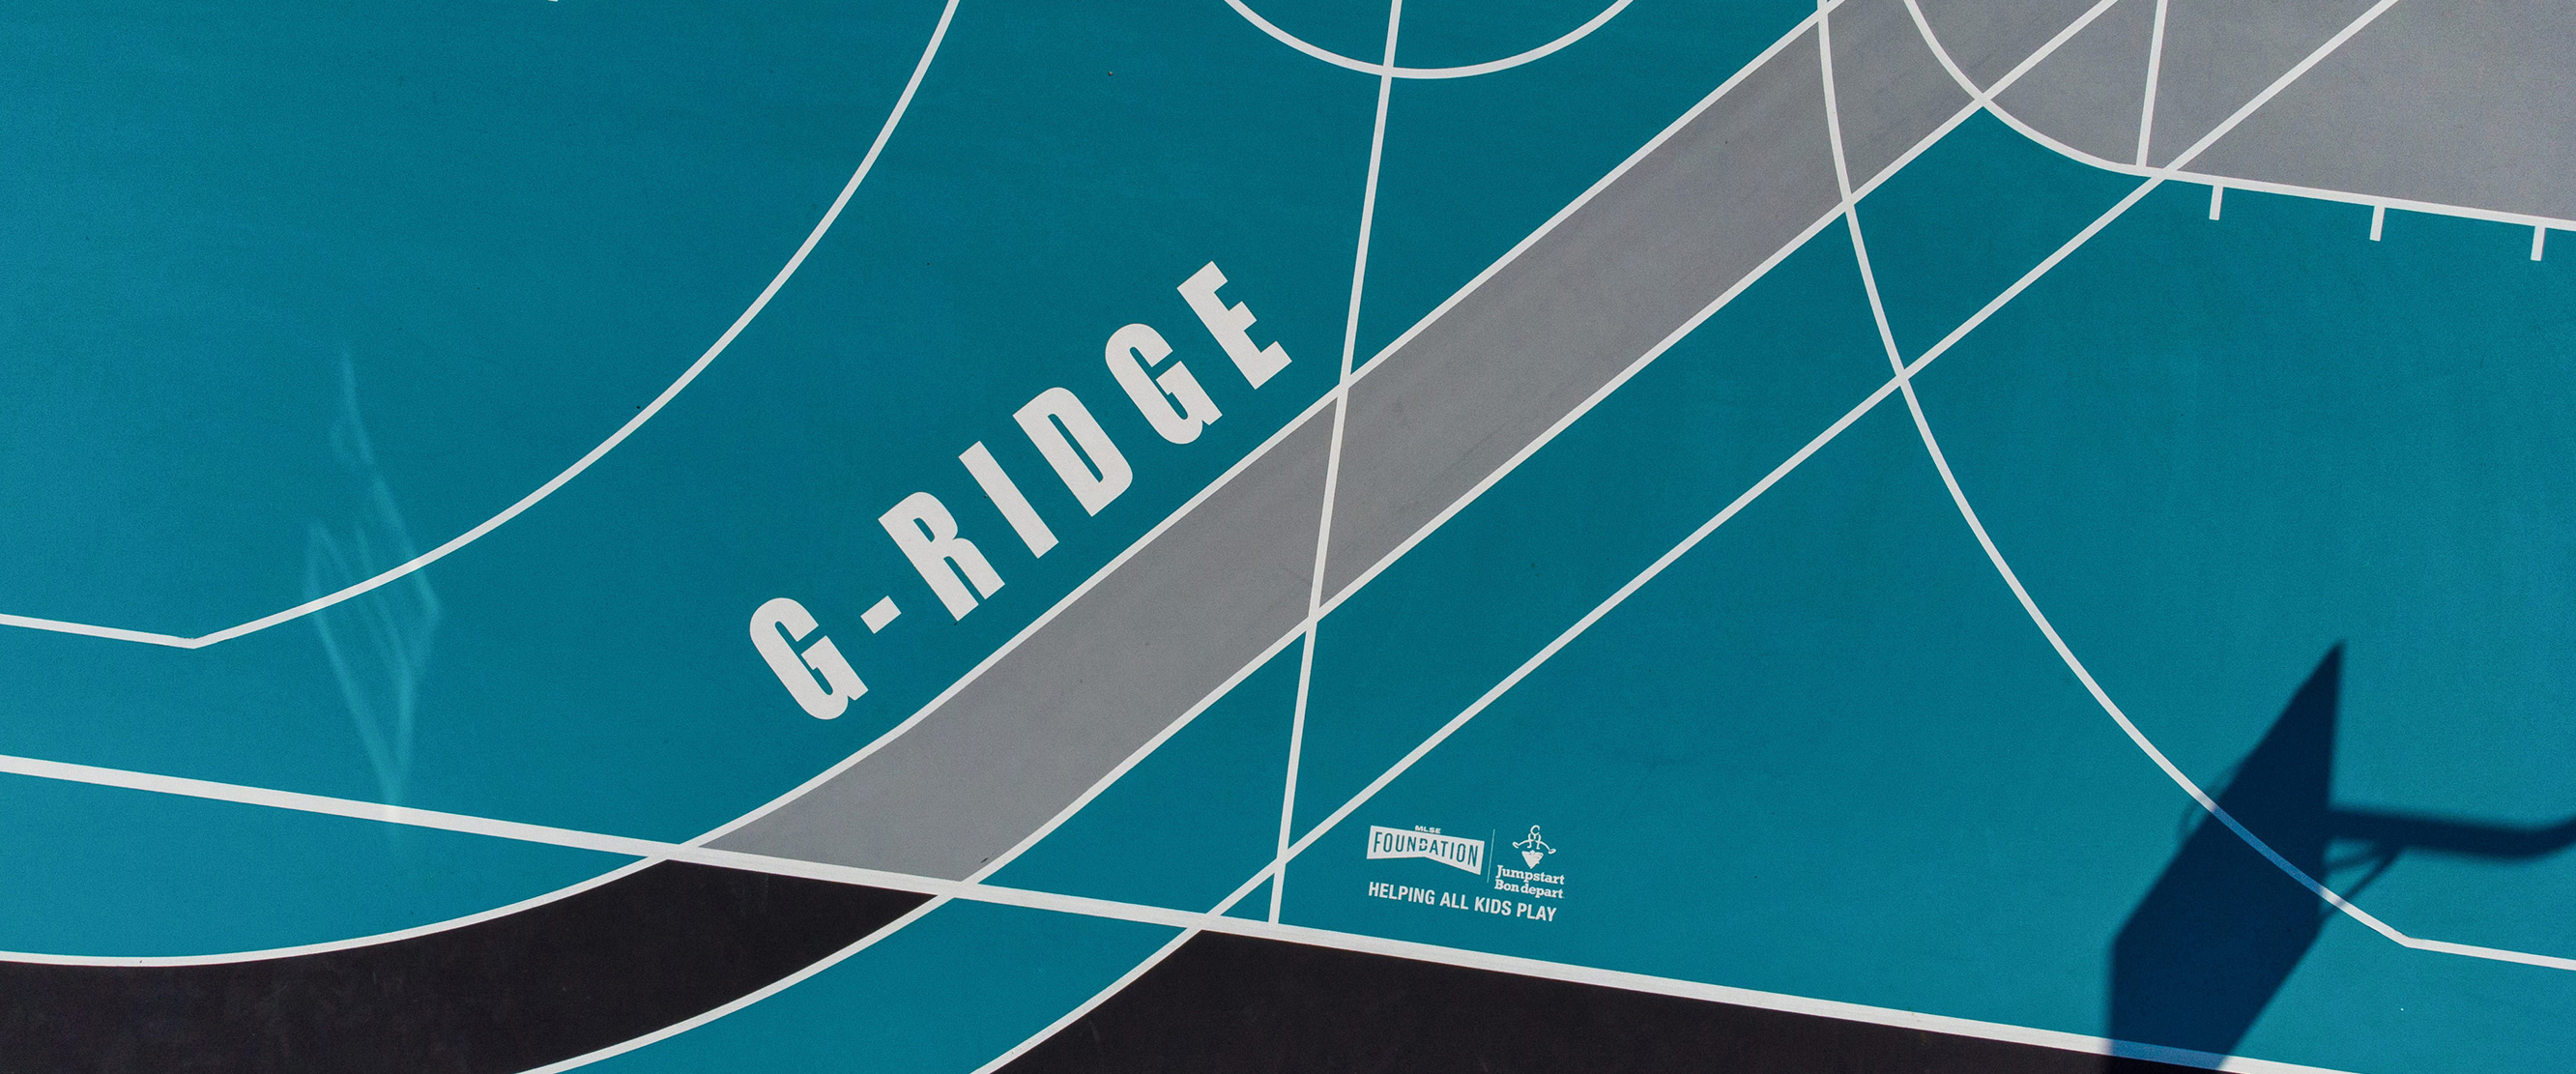 The Gordonridge Community Project